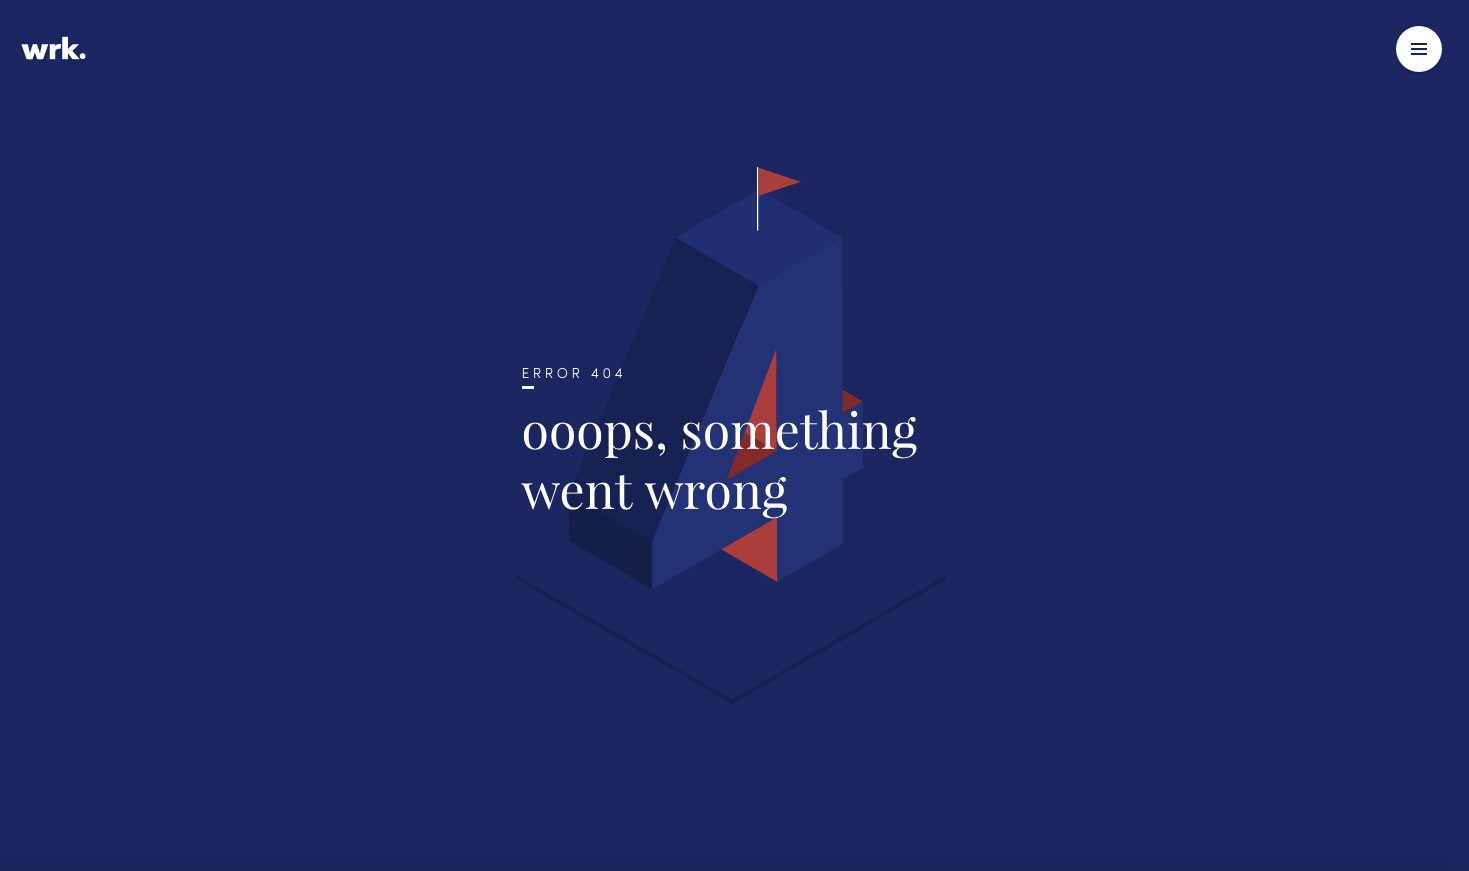 404 page: waark